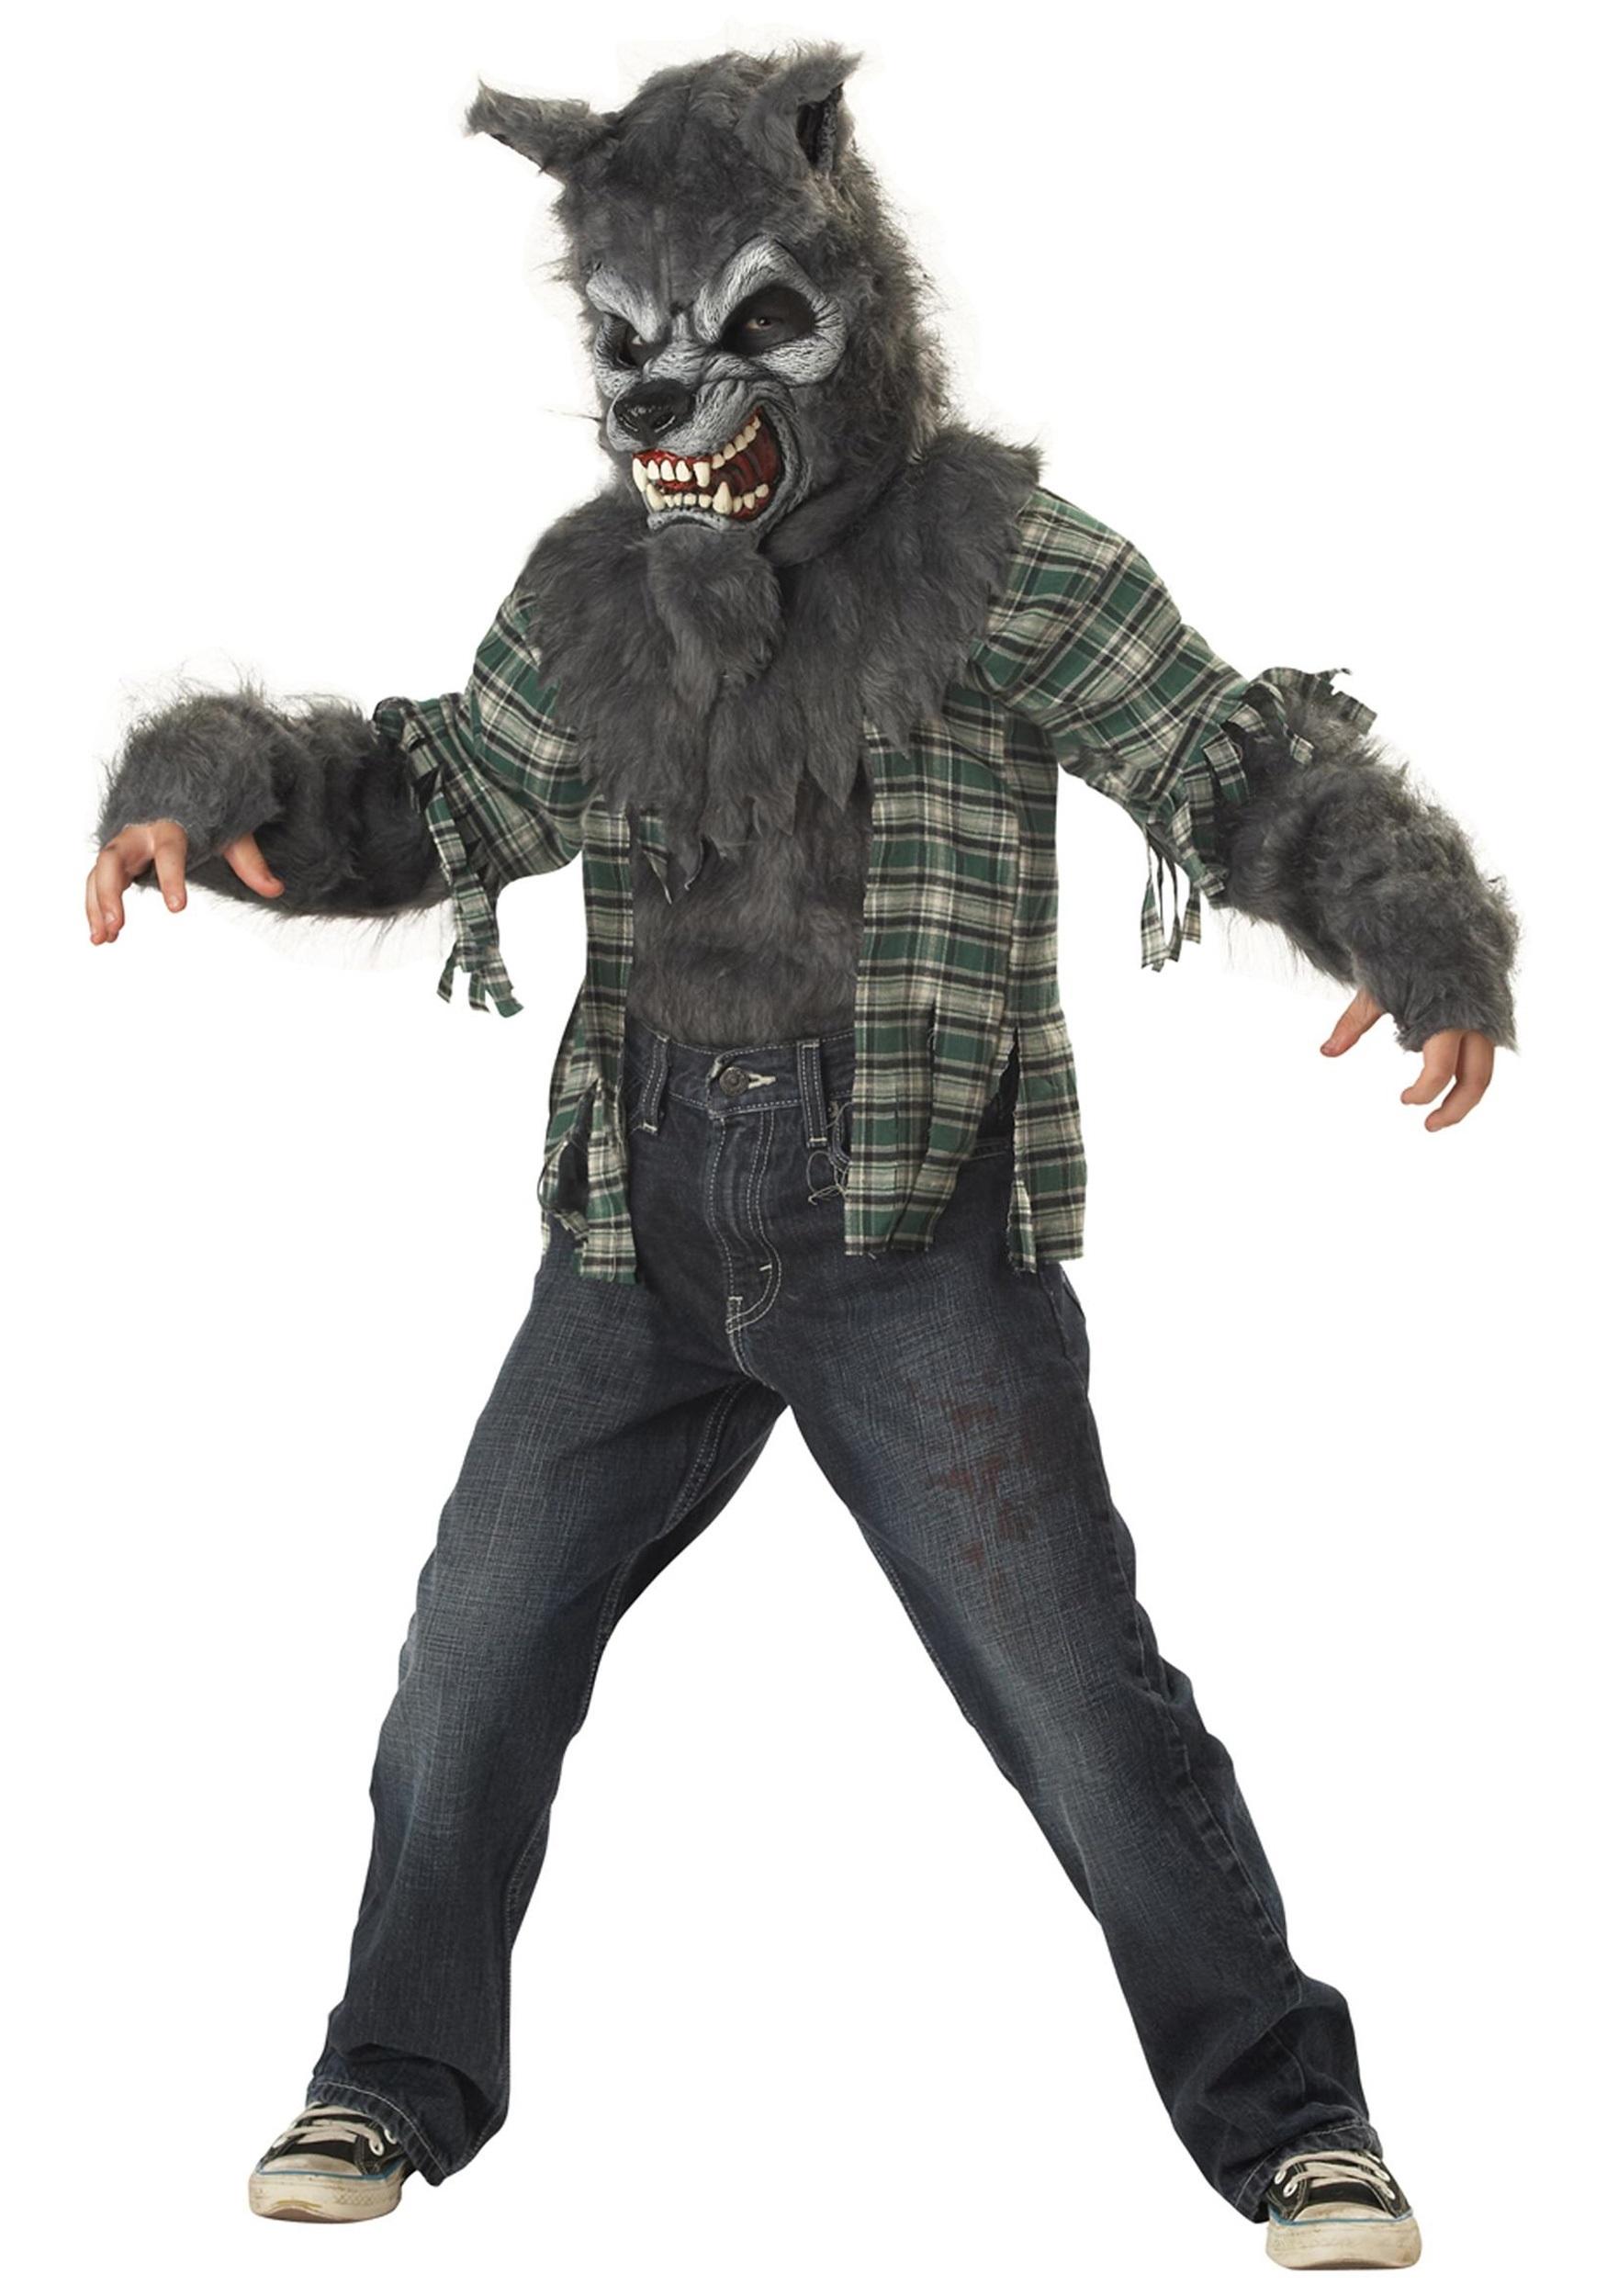 Kids Werewolf Costume  sc 1 st  Fun.com & Werewolf Costume for Kids